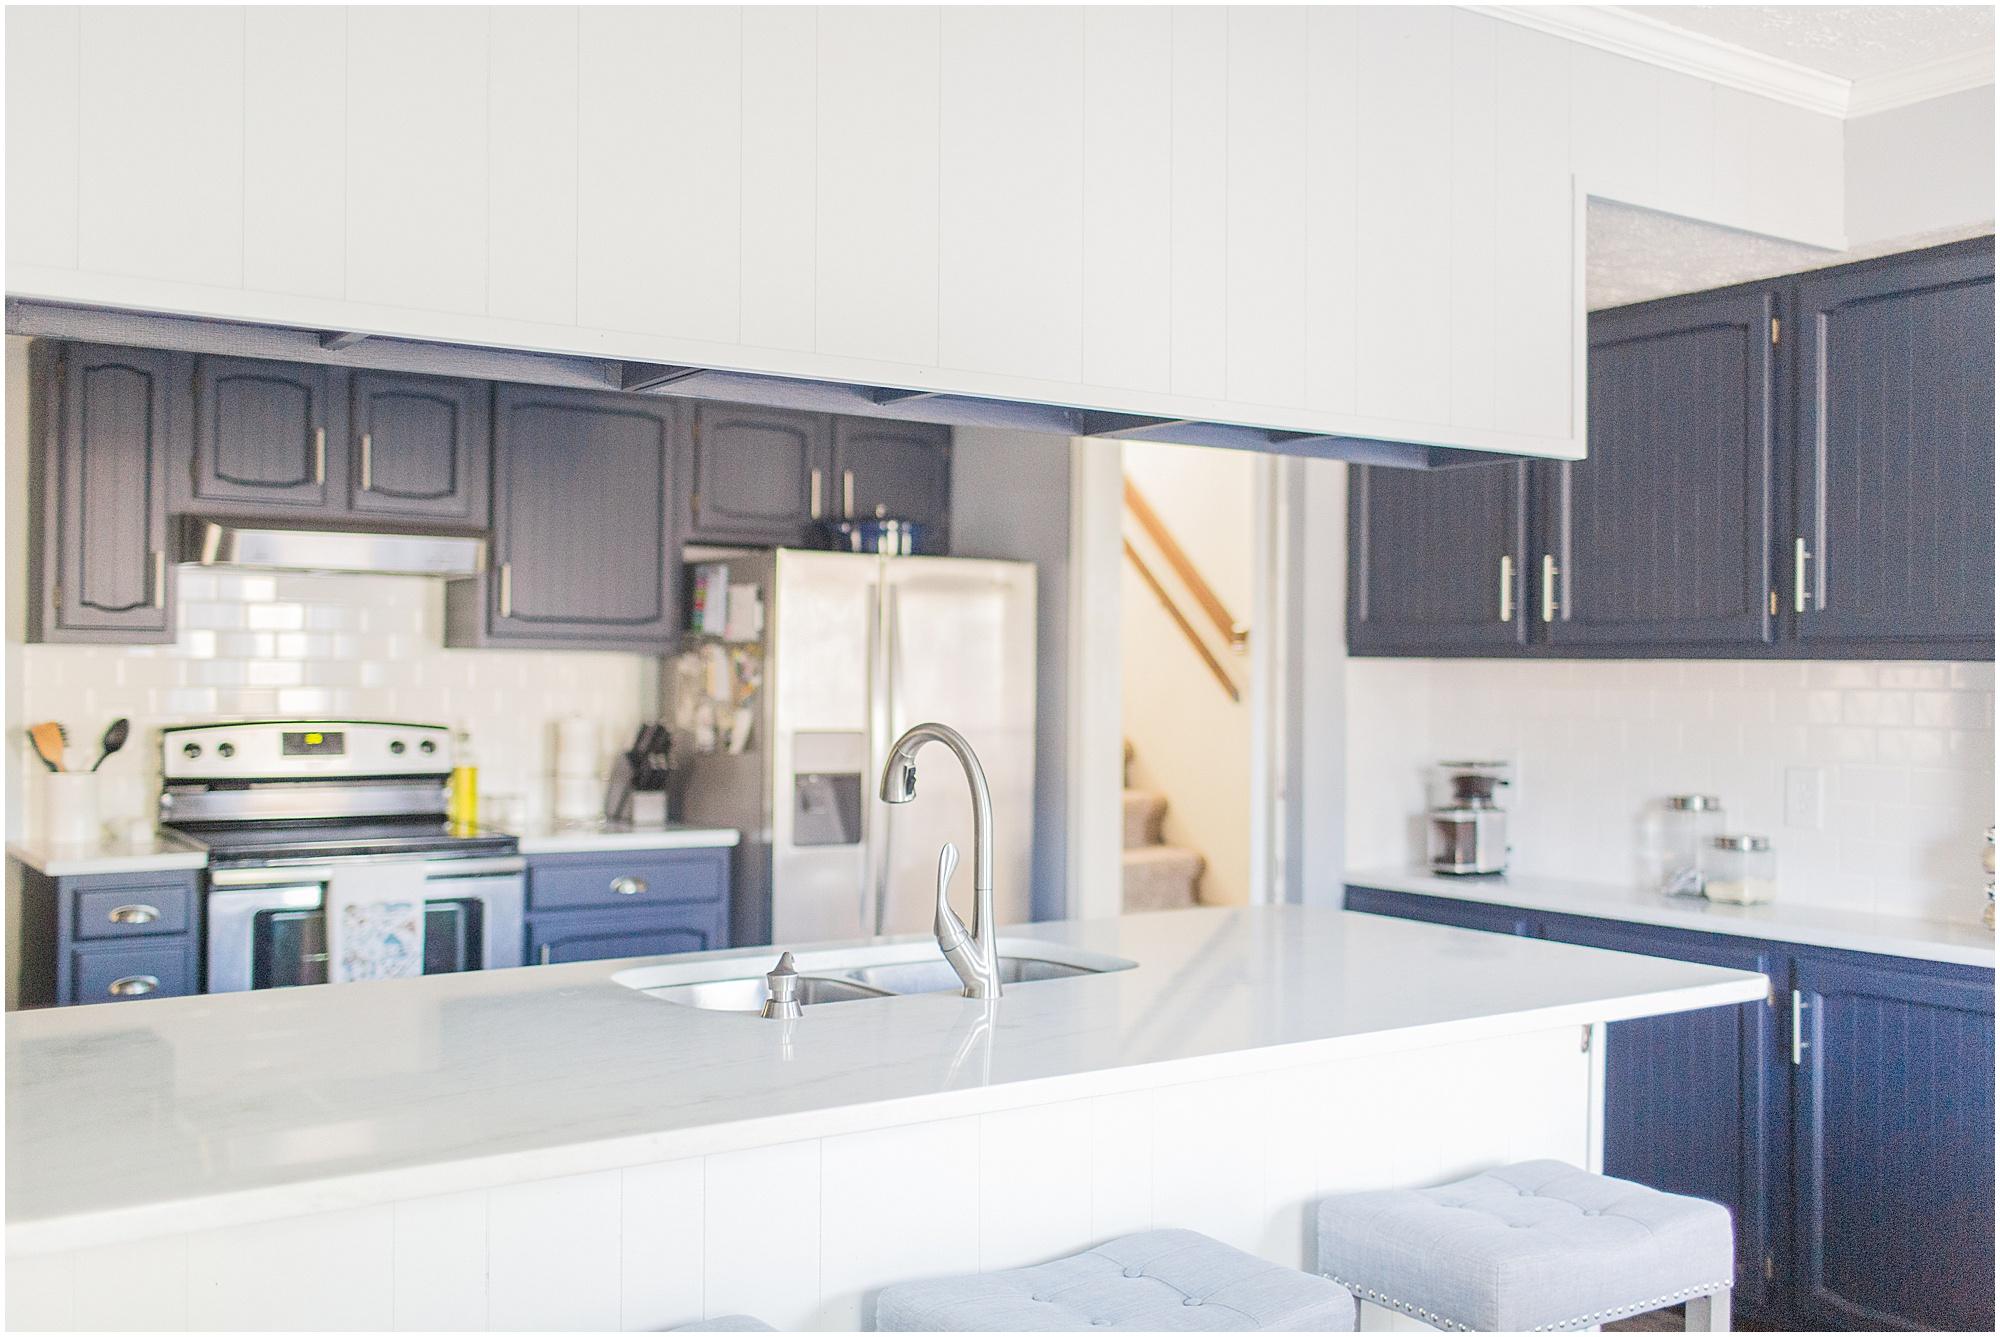 hambick-house-kitchen-renovation-fixer-upper_0023.jpg